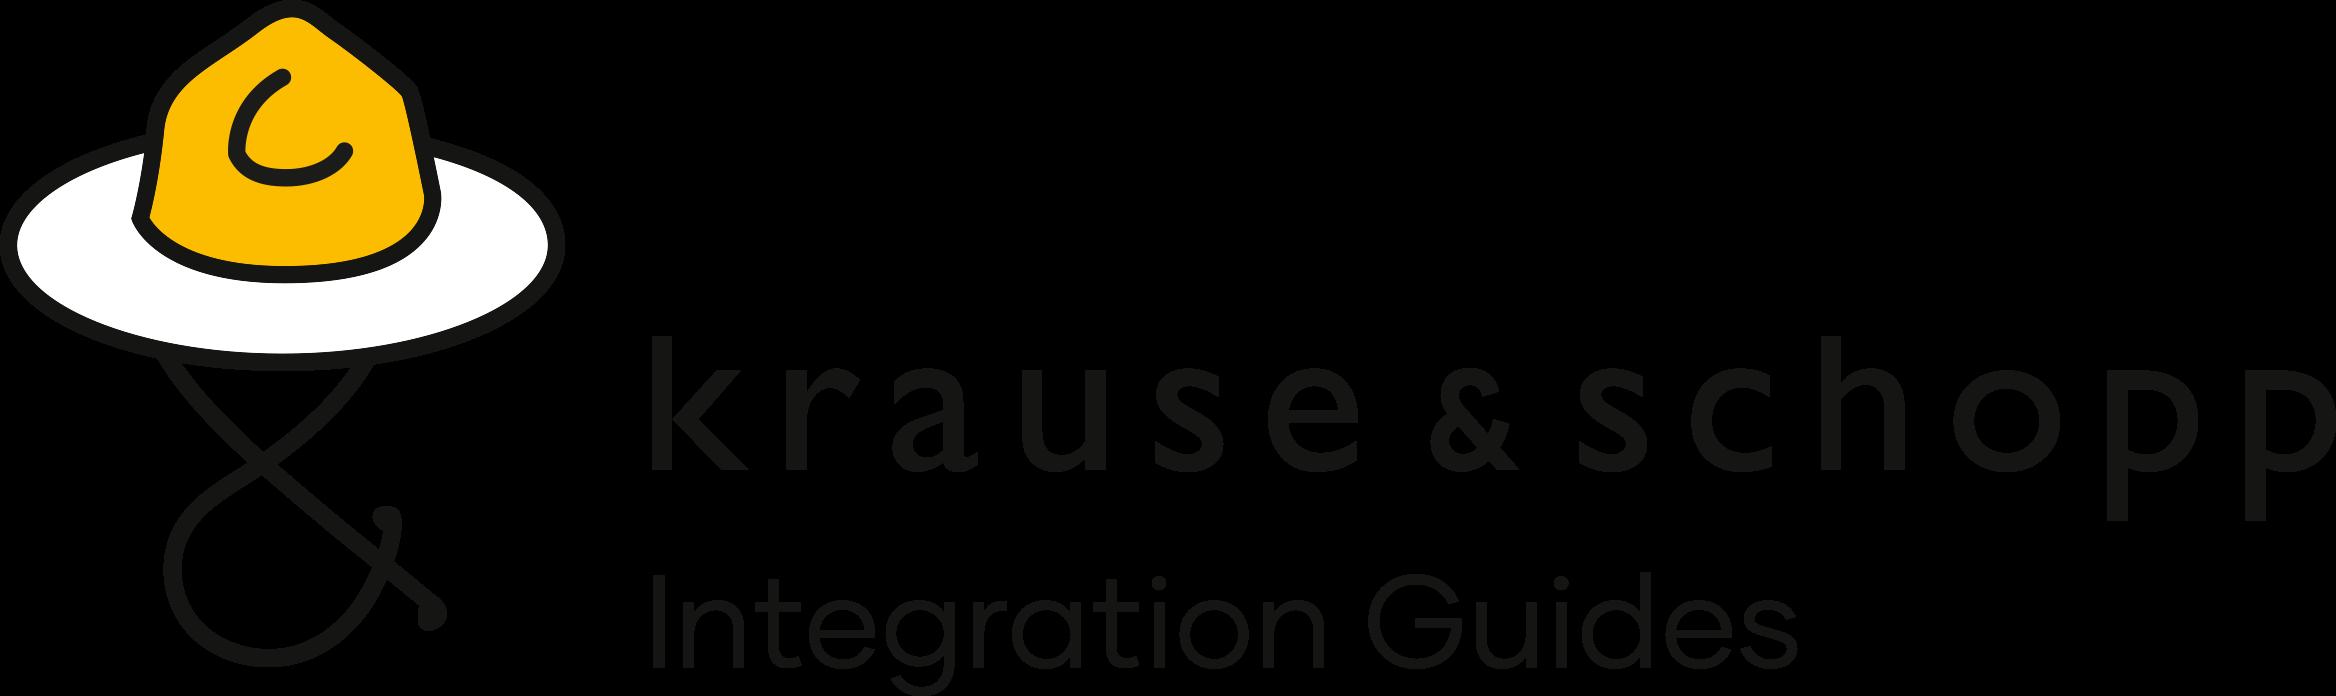 Krause & Schopp Logo